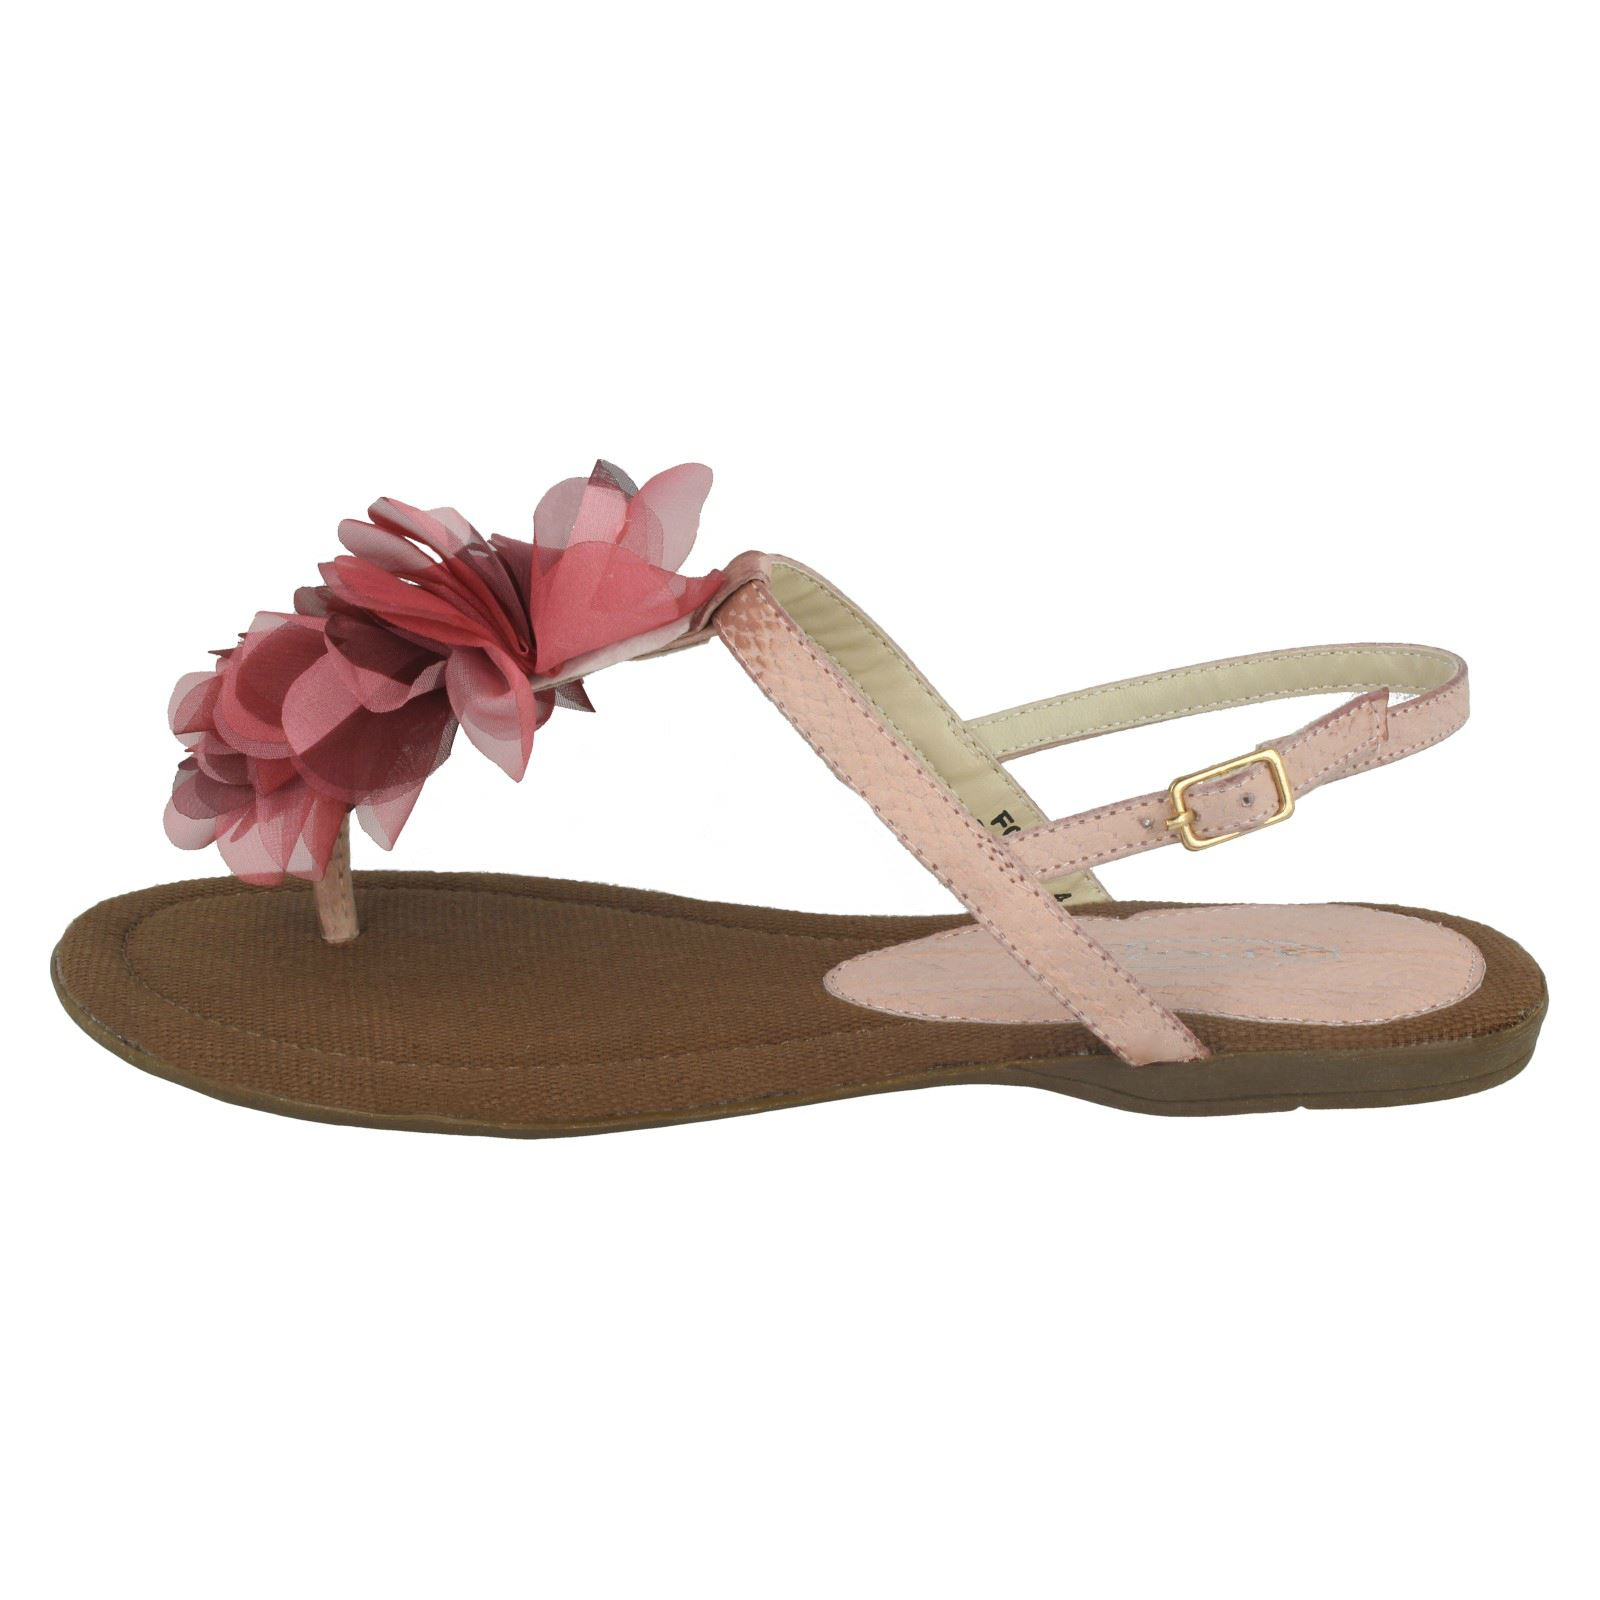 Damas Spot on Flat Sandalias Toe Post Con Detalle De Flor